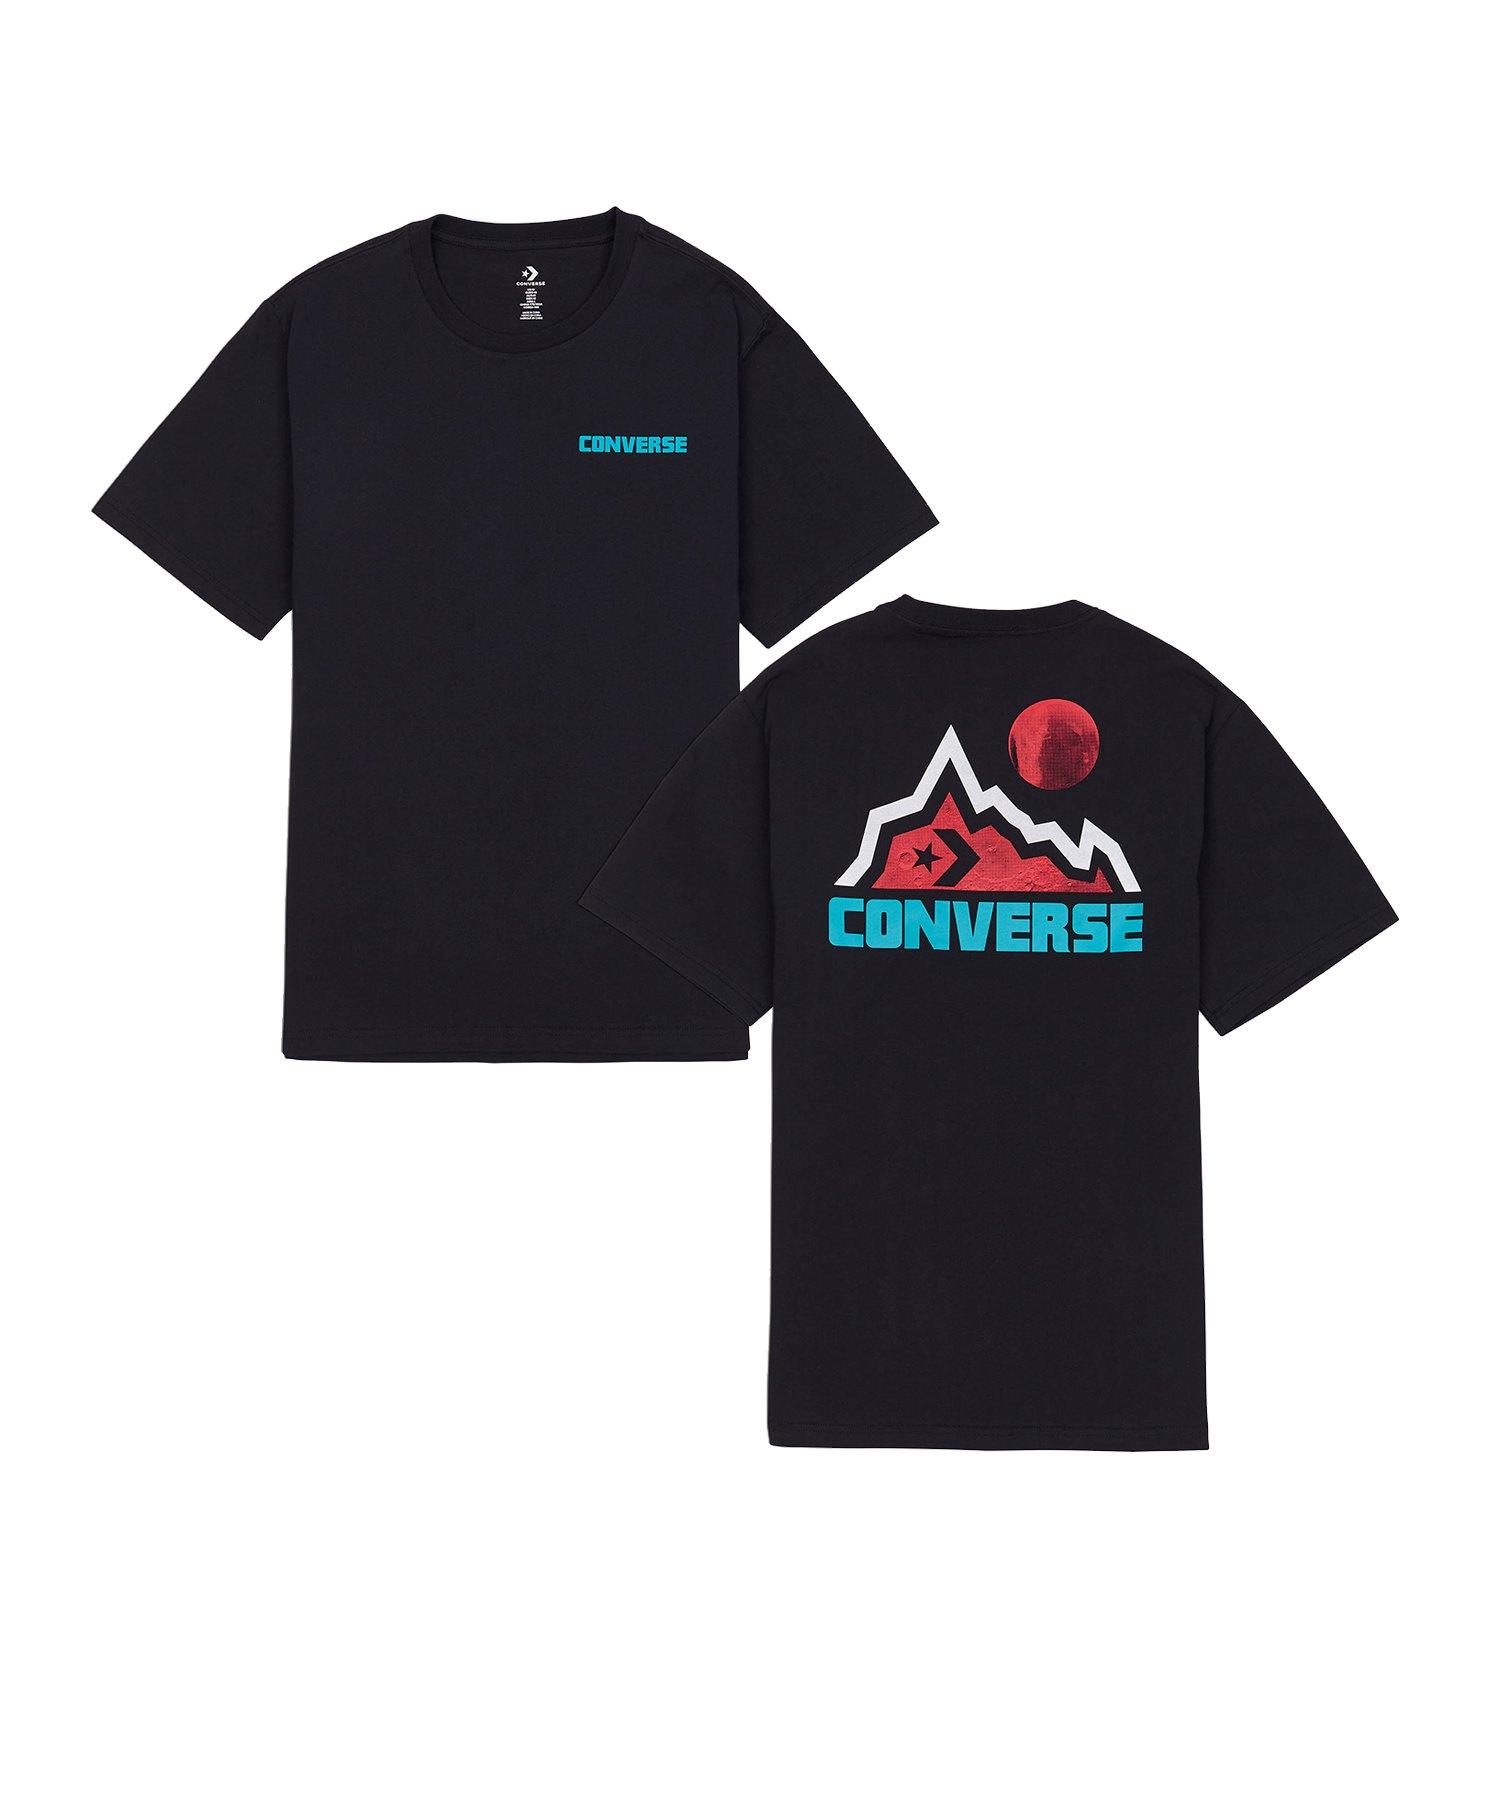 Converse Mountain Moon Graphic T-Shirt Schwarz - schwarz